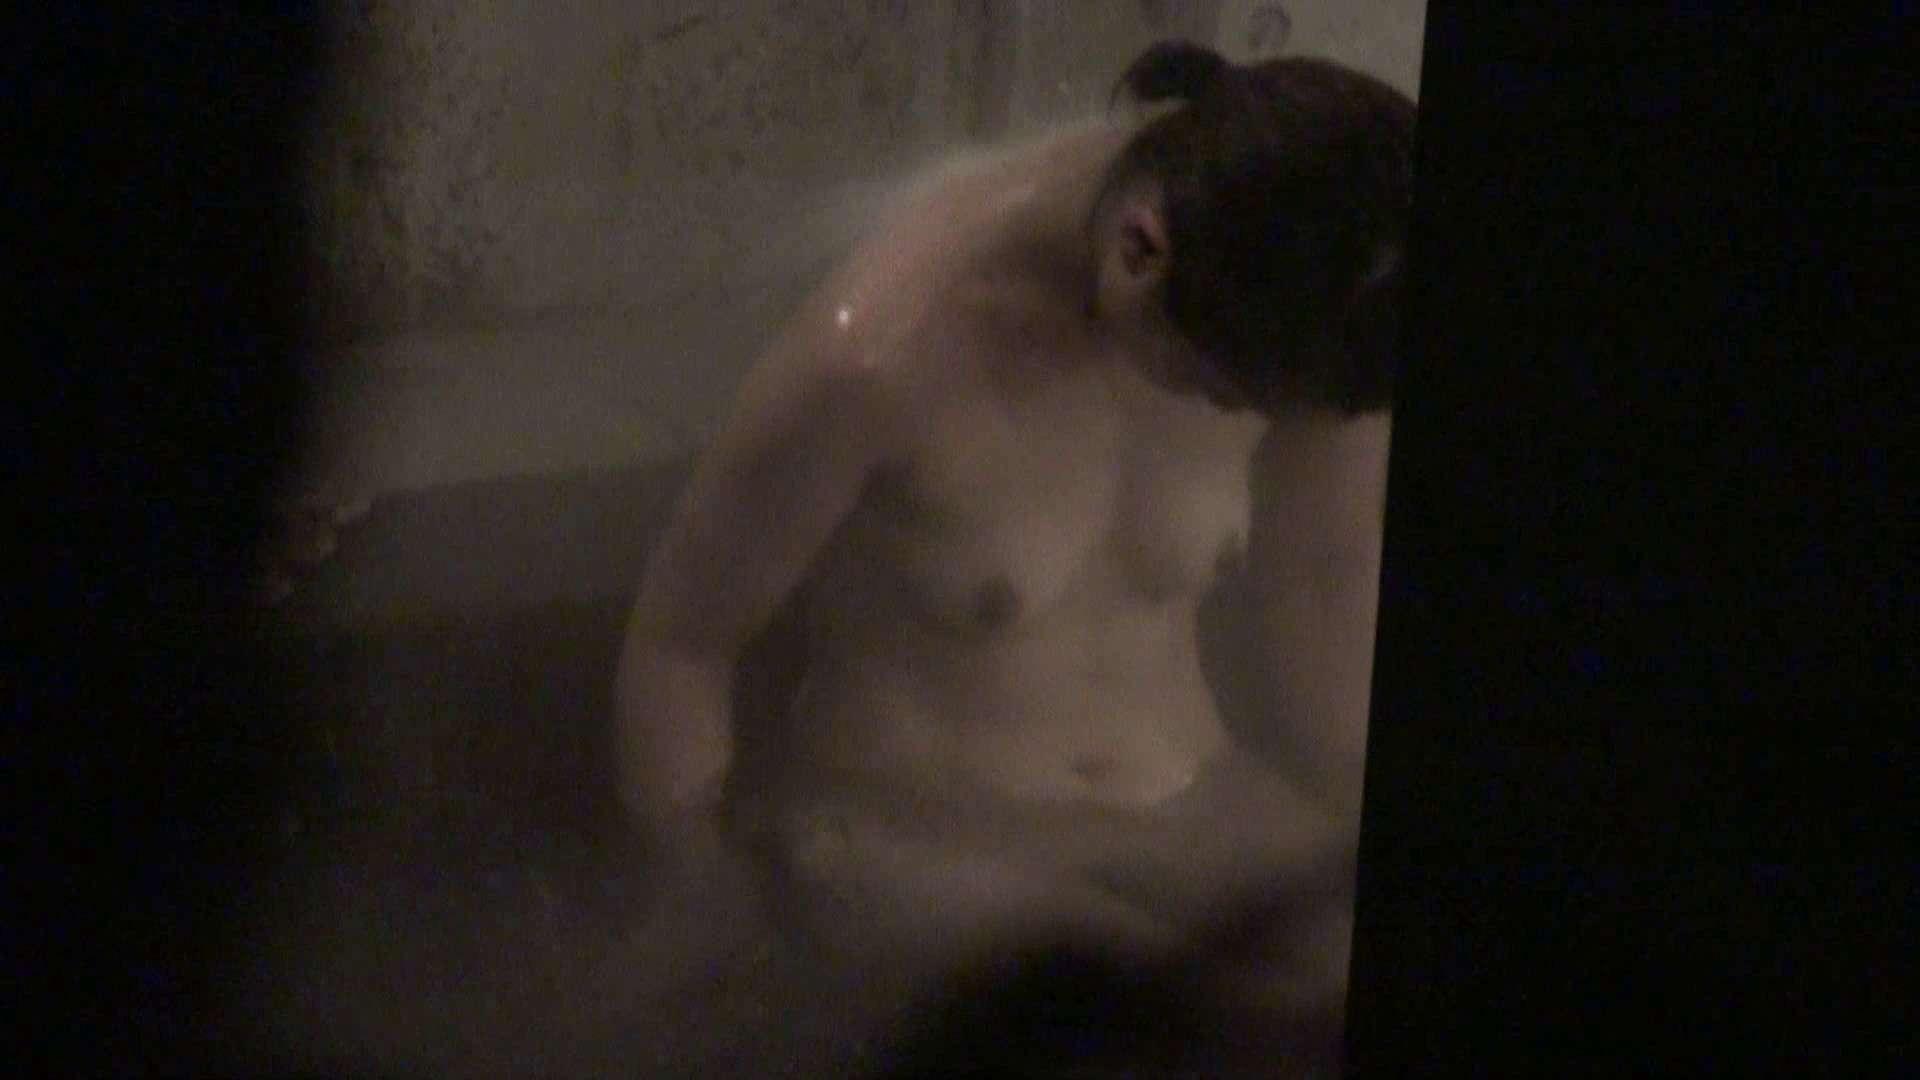 Aquaな露天風呂Vol.426 OLセックス 盗み撮りオマンコ動画キャプチャ 106画像 65